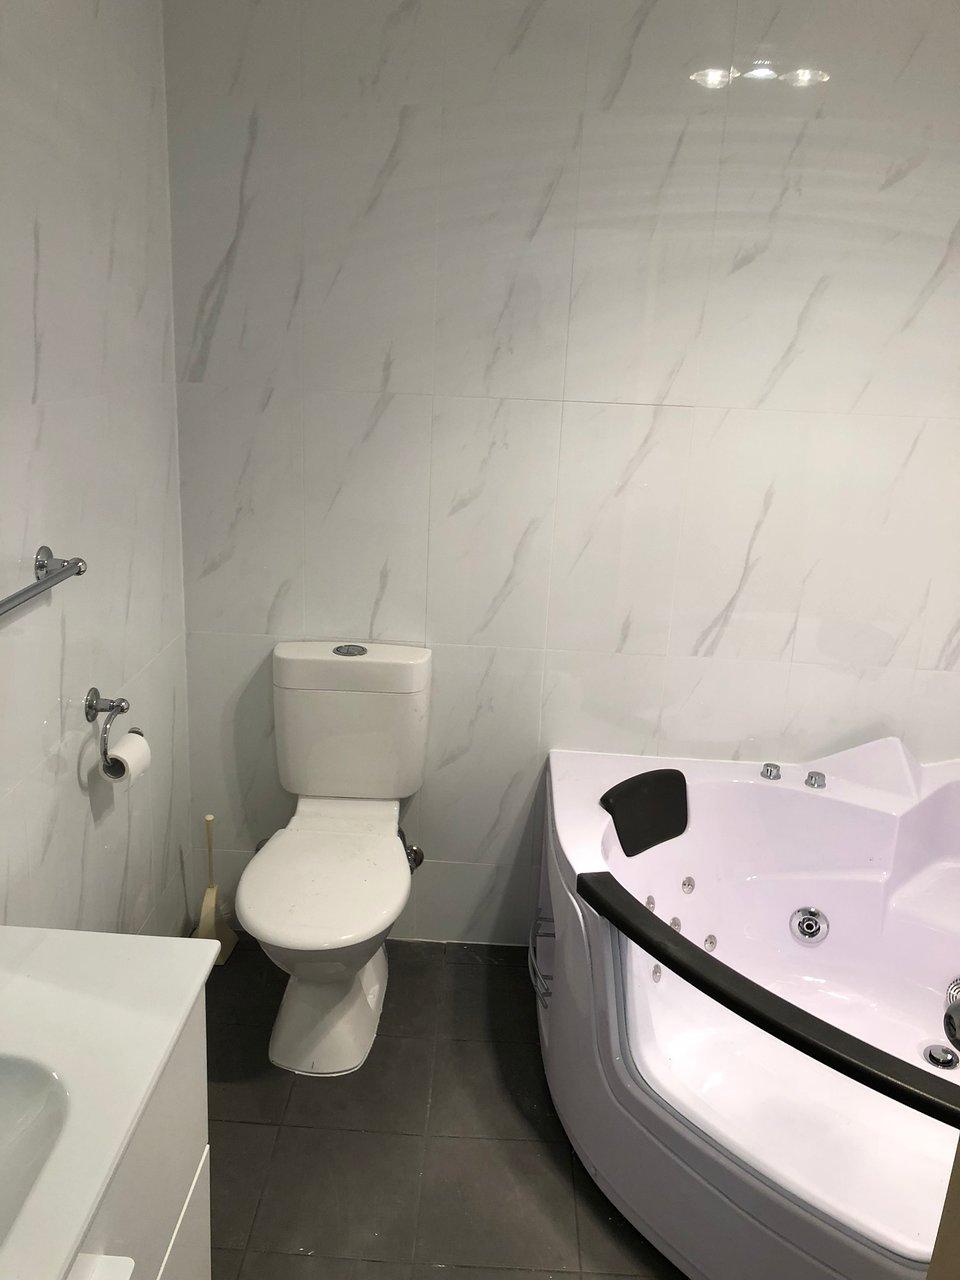 jacksons motor inn 43 6 6 updated 2019 prices hotel rh tripadvisor com